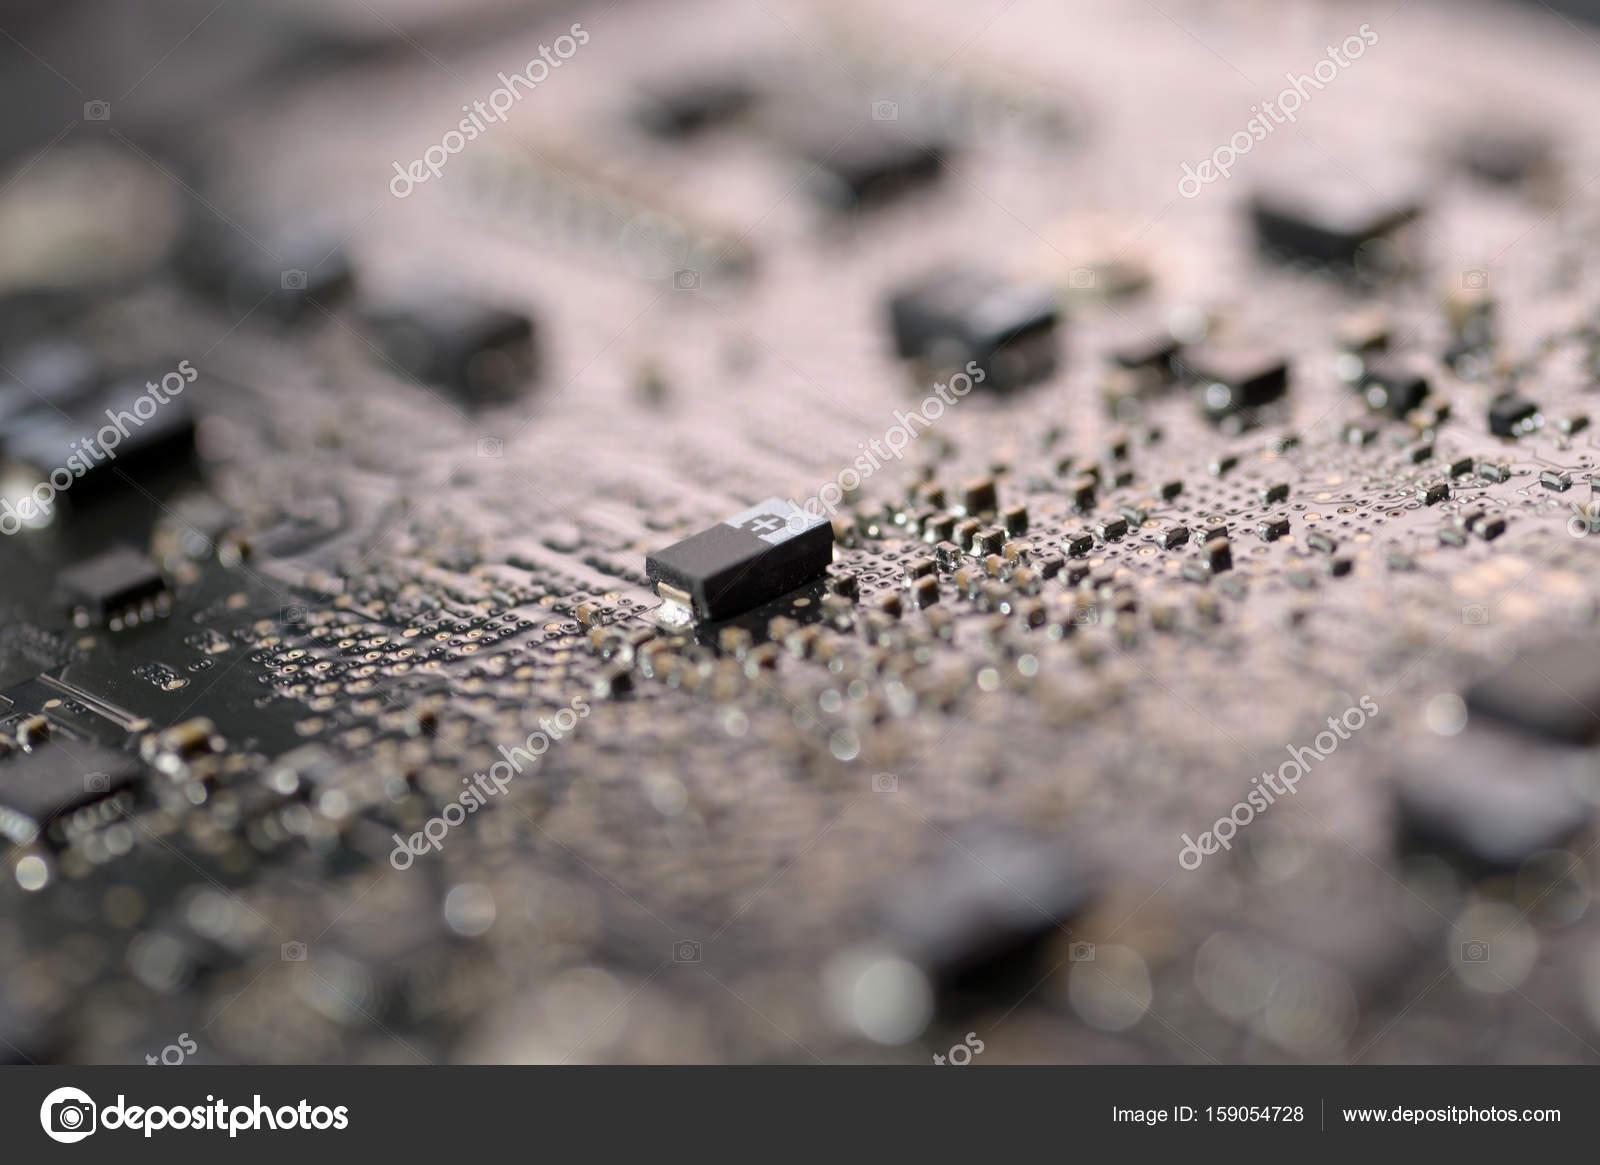 close-up smd capacitor — Stock Photo © seenadee@hotmail com